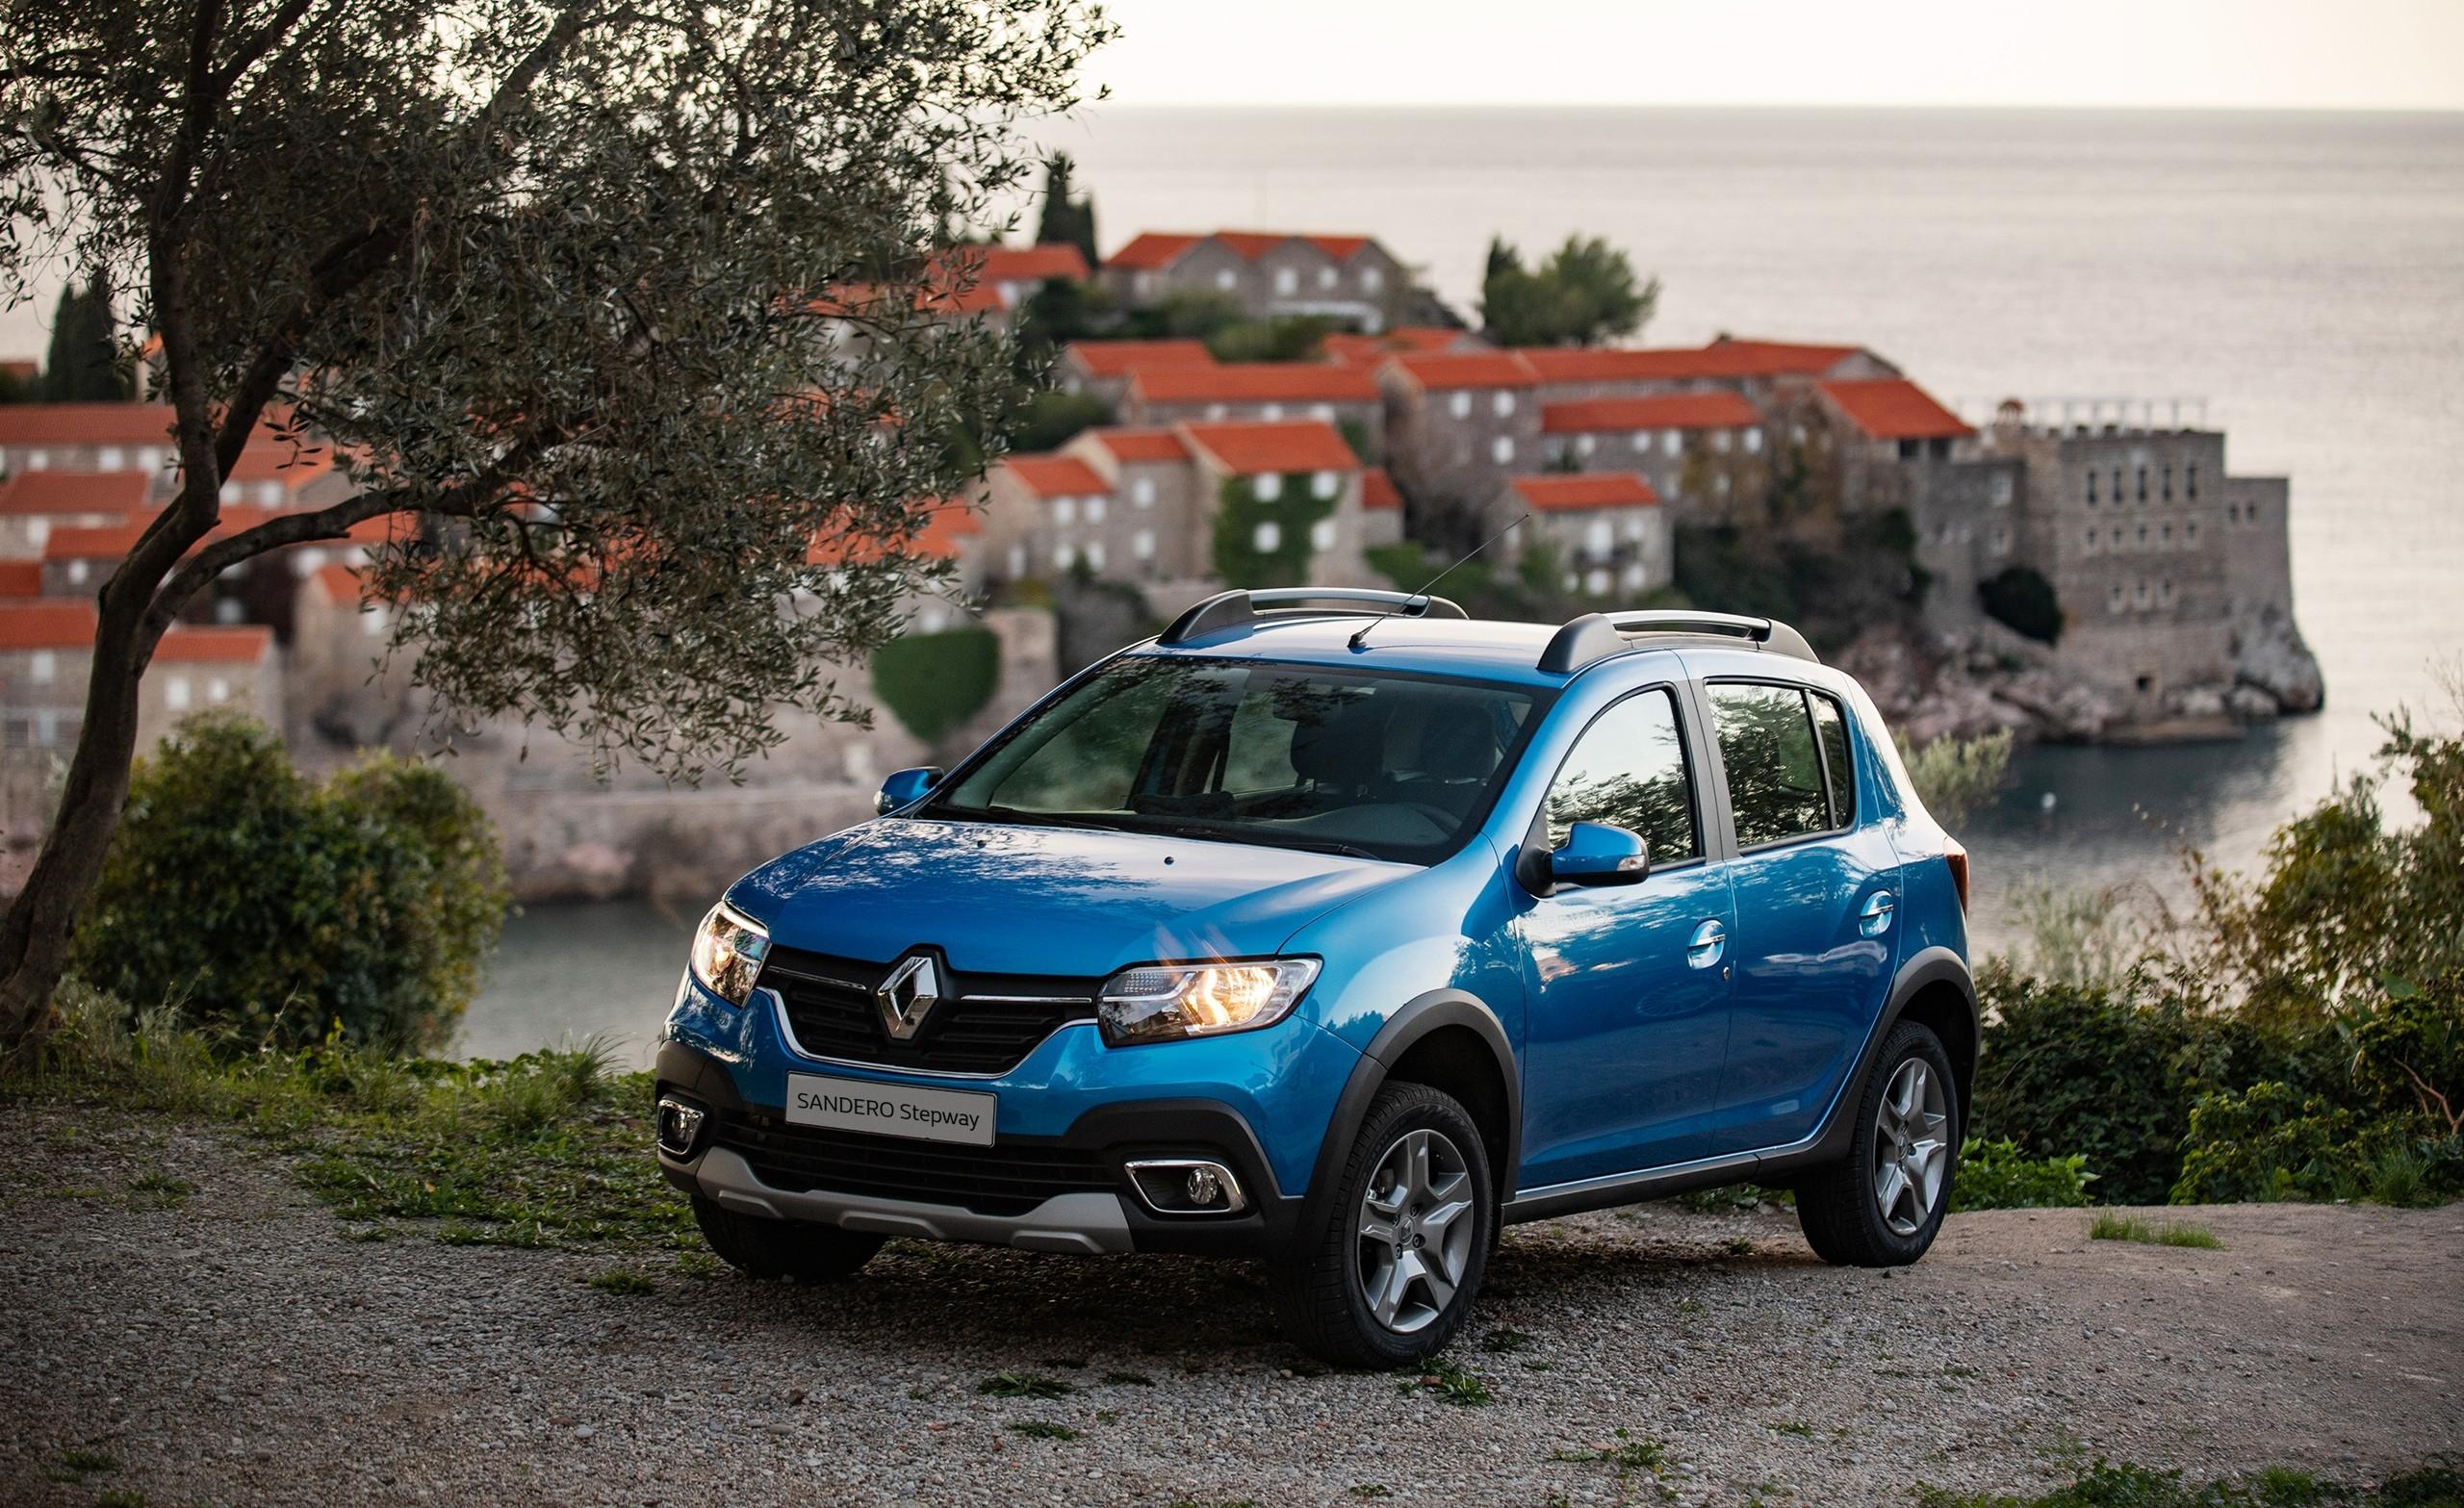 "<p>Фото: © VK/ <a href=""https://vk.com/renaultru"" target=""_self"">Renault Россия</a></p>"